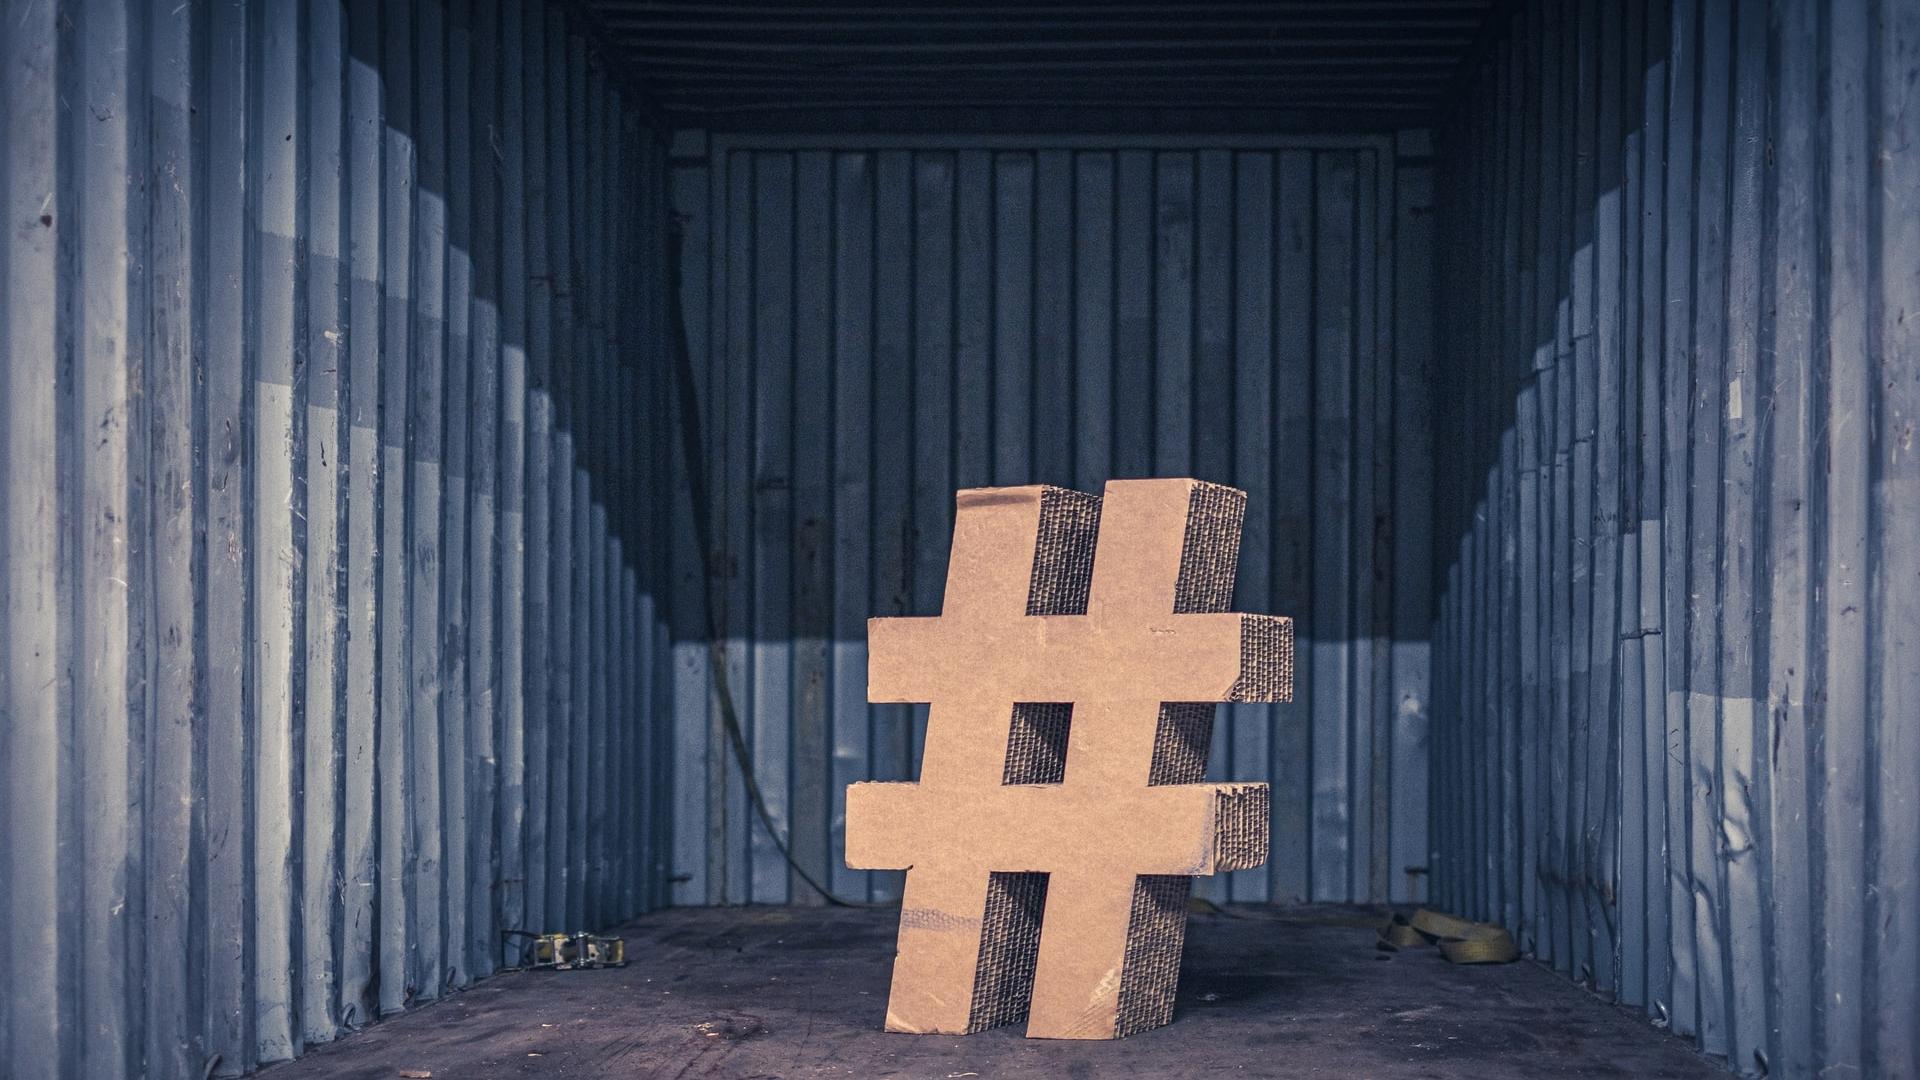 usarhashtags